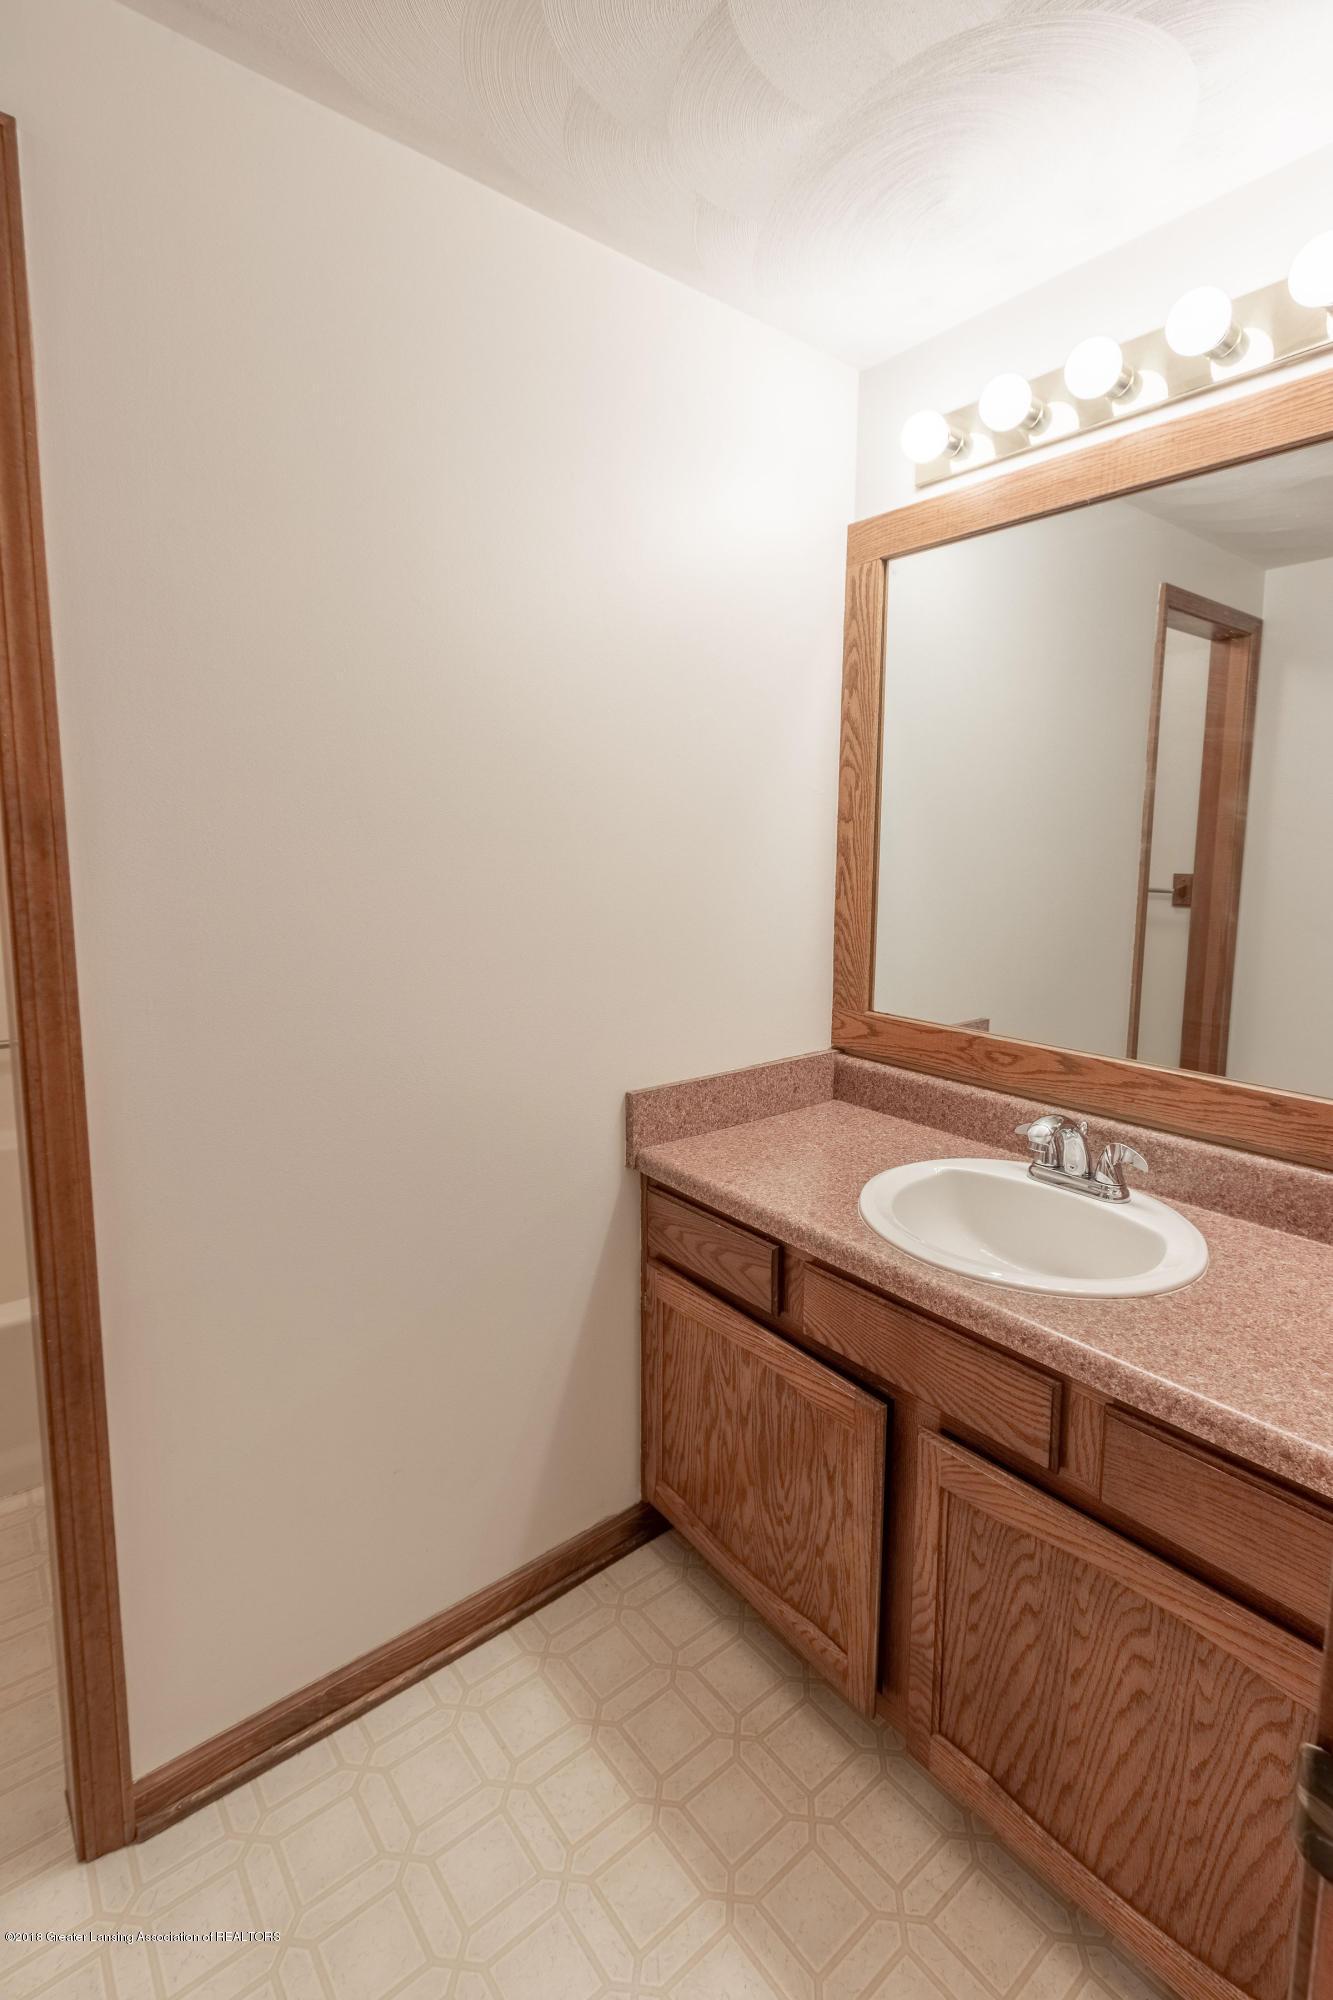 3981 Breckinridge Dr - Upstairs Full Bath - 36